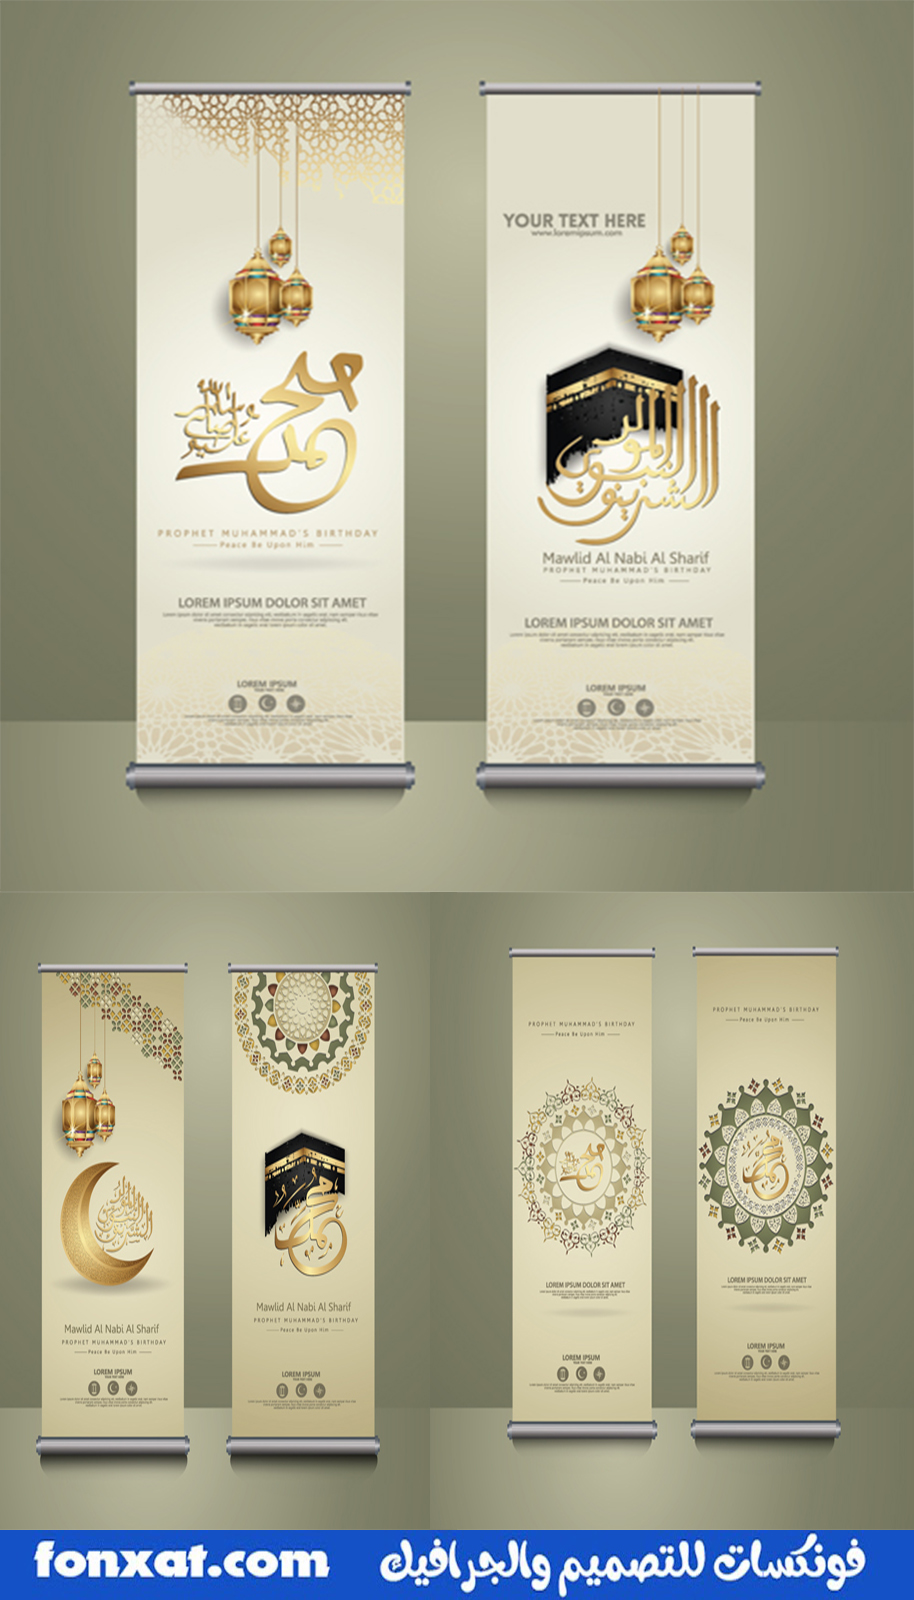 Islamic roll up banners for Ramadan and Hajj season